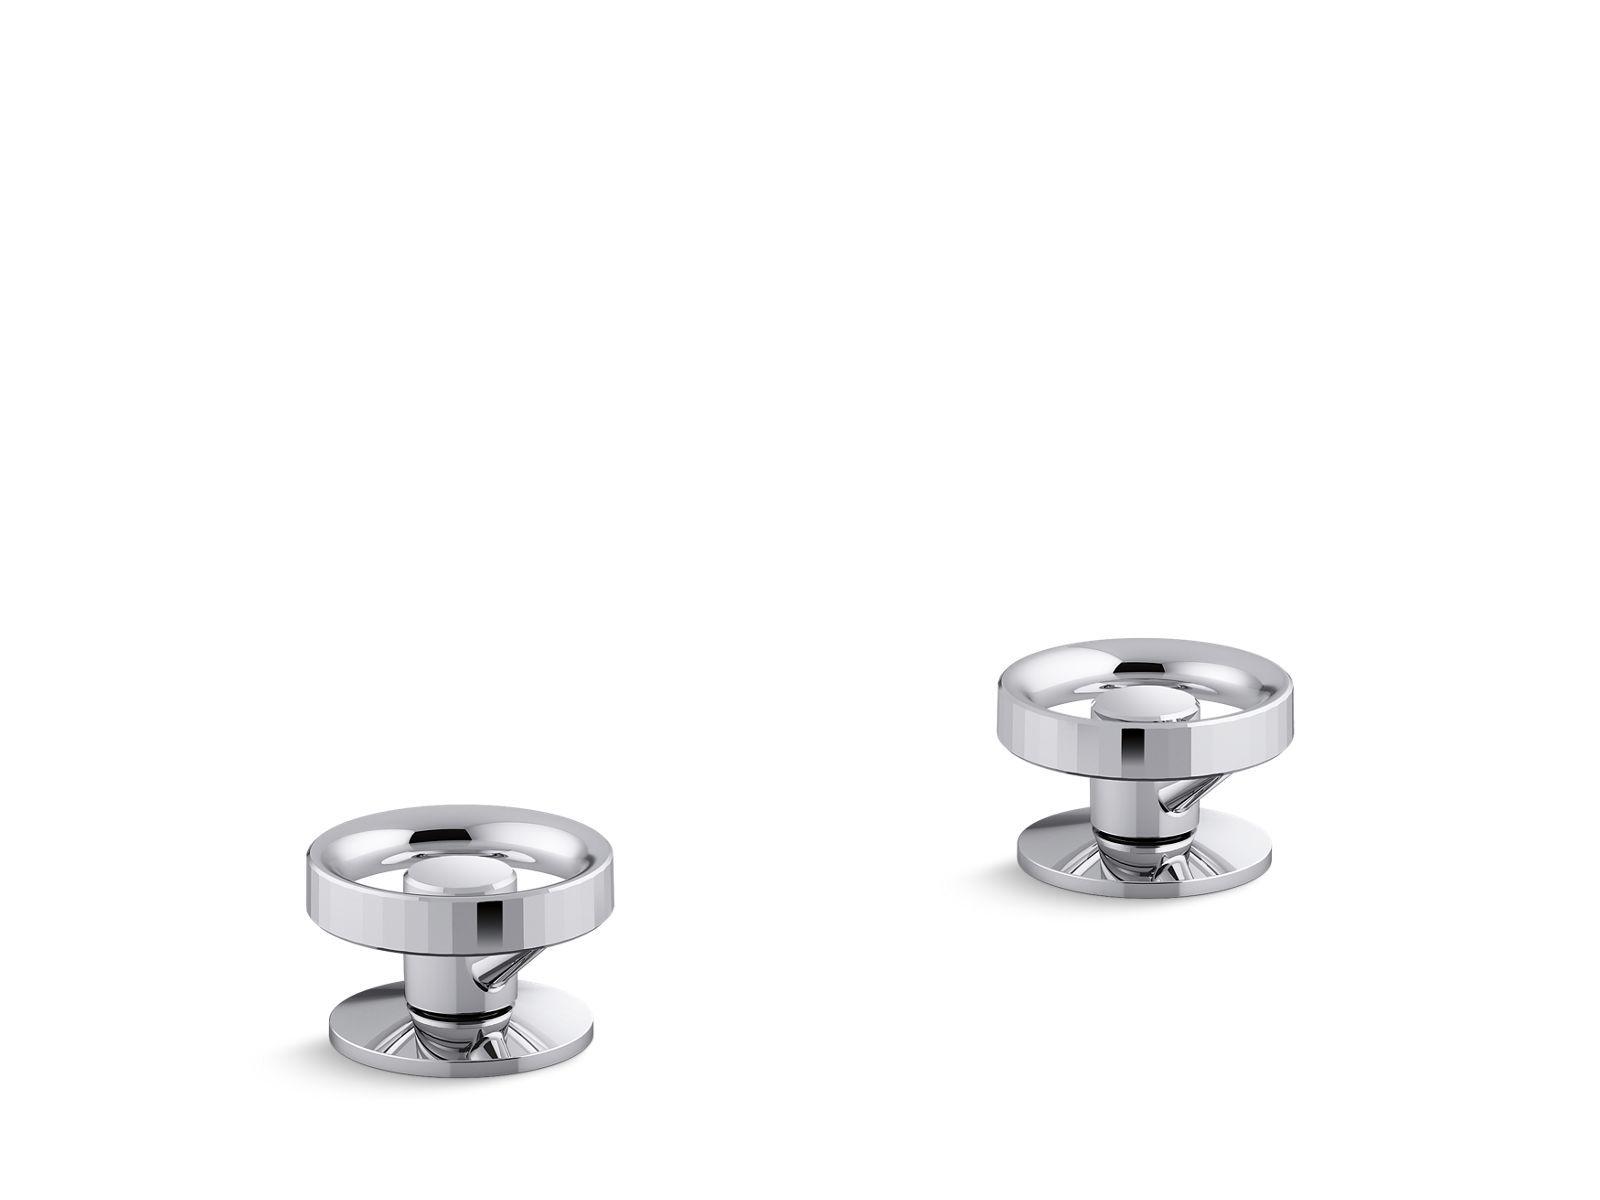 K 77974 9 Components Bathroom Sink Handles With Lever Design